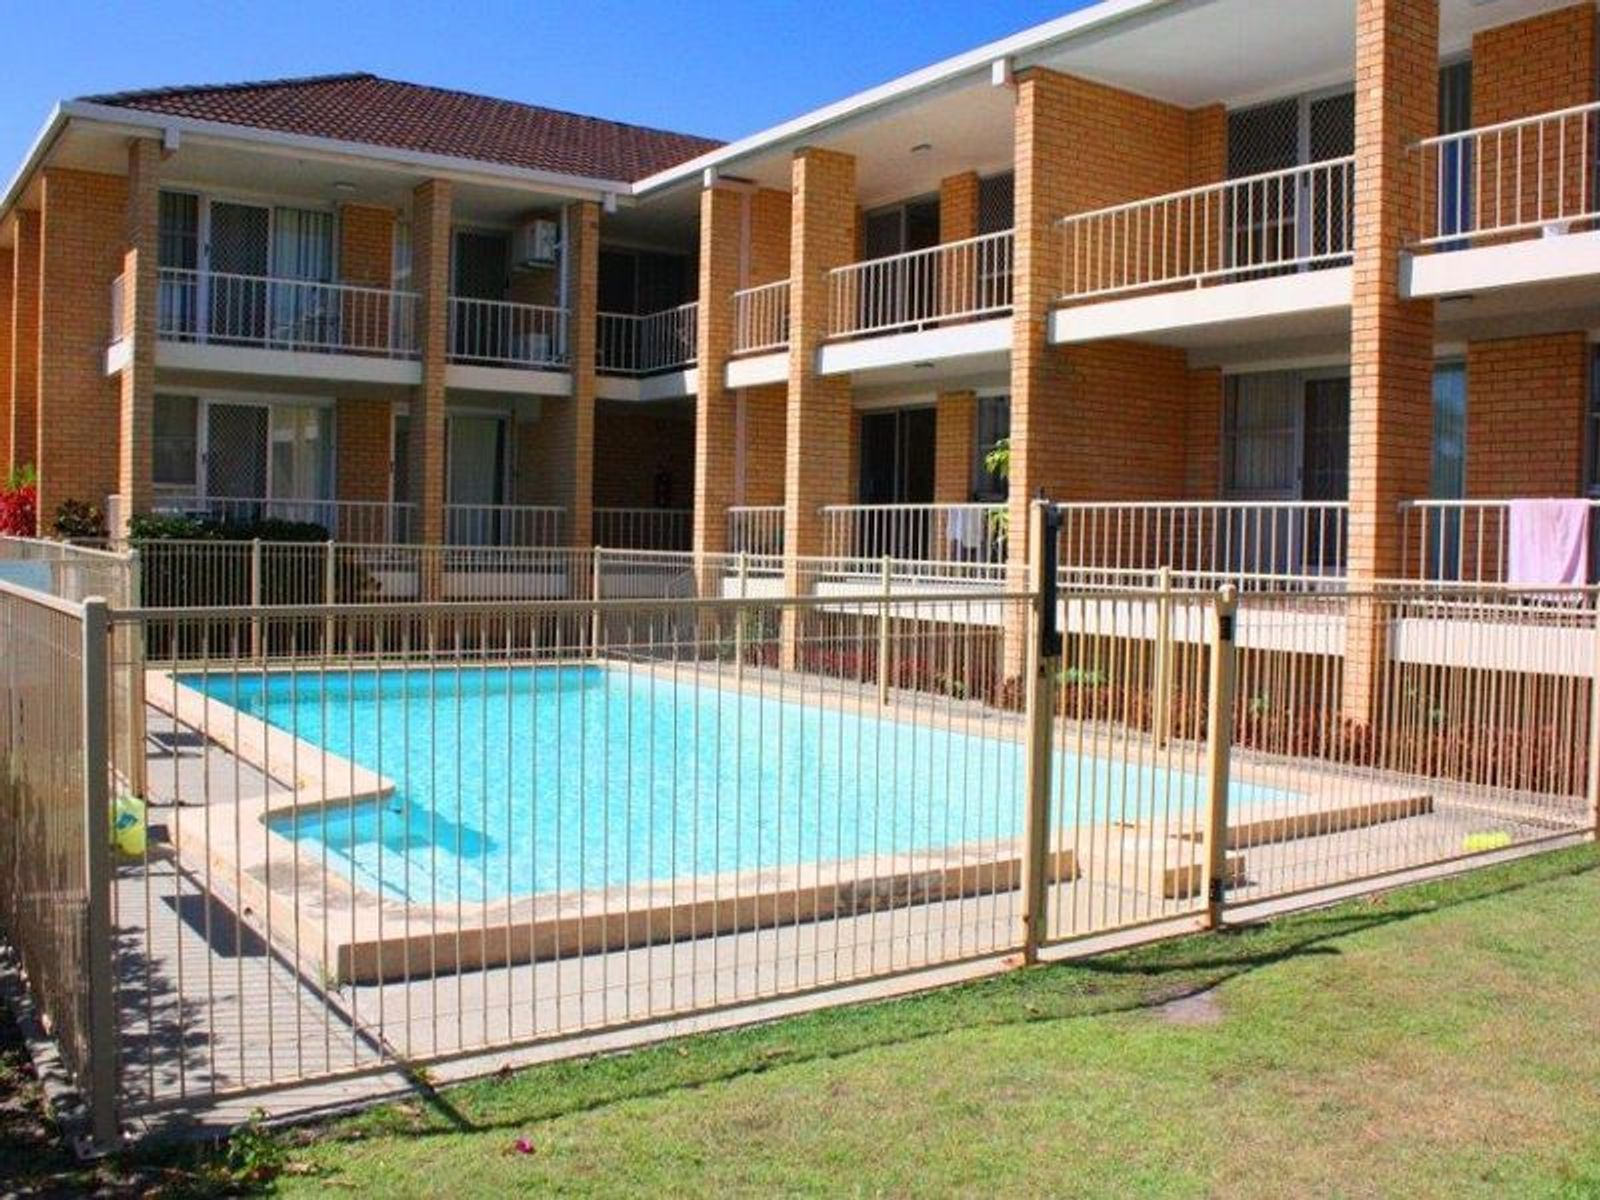 3/10 Sunrise Boulevard, Surfers Paradise, QLD 4217